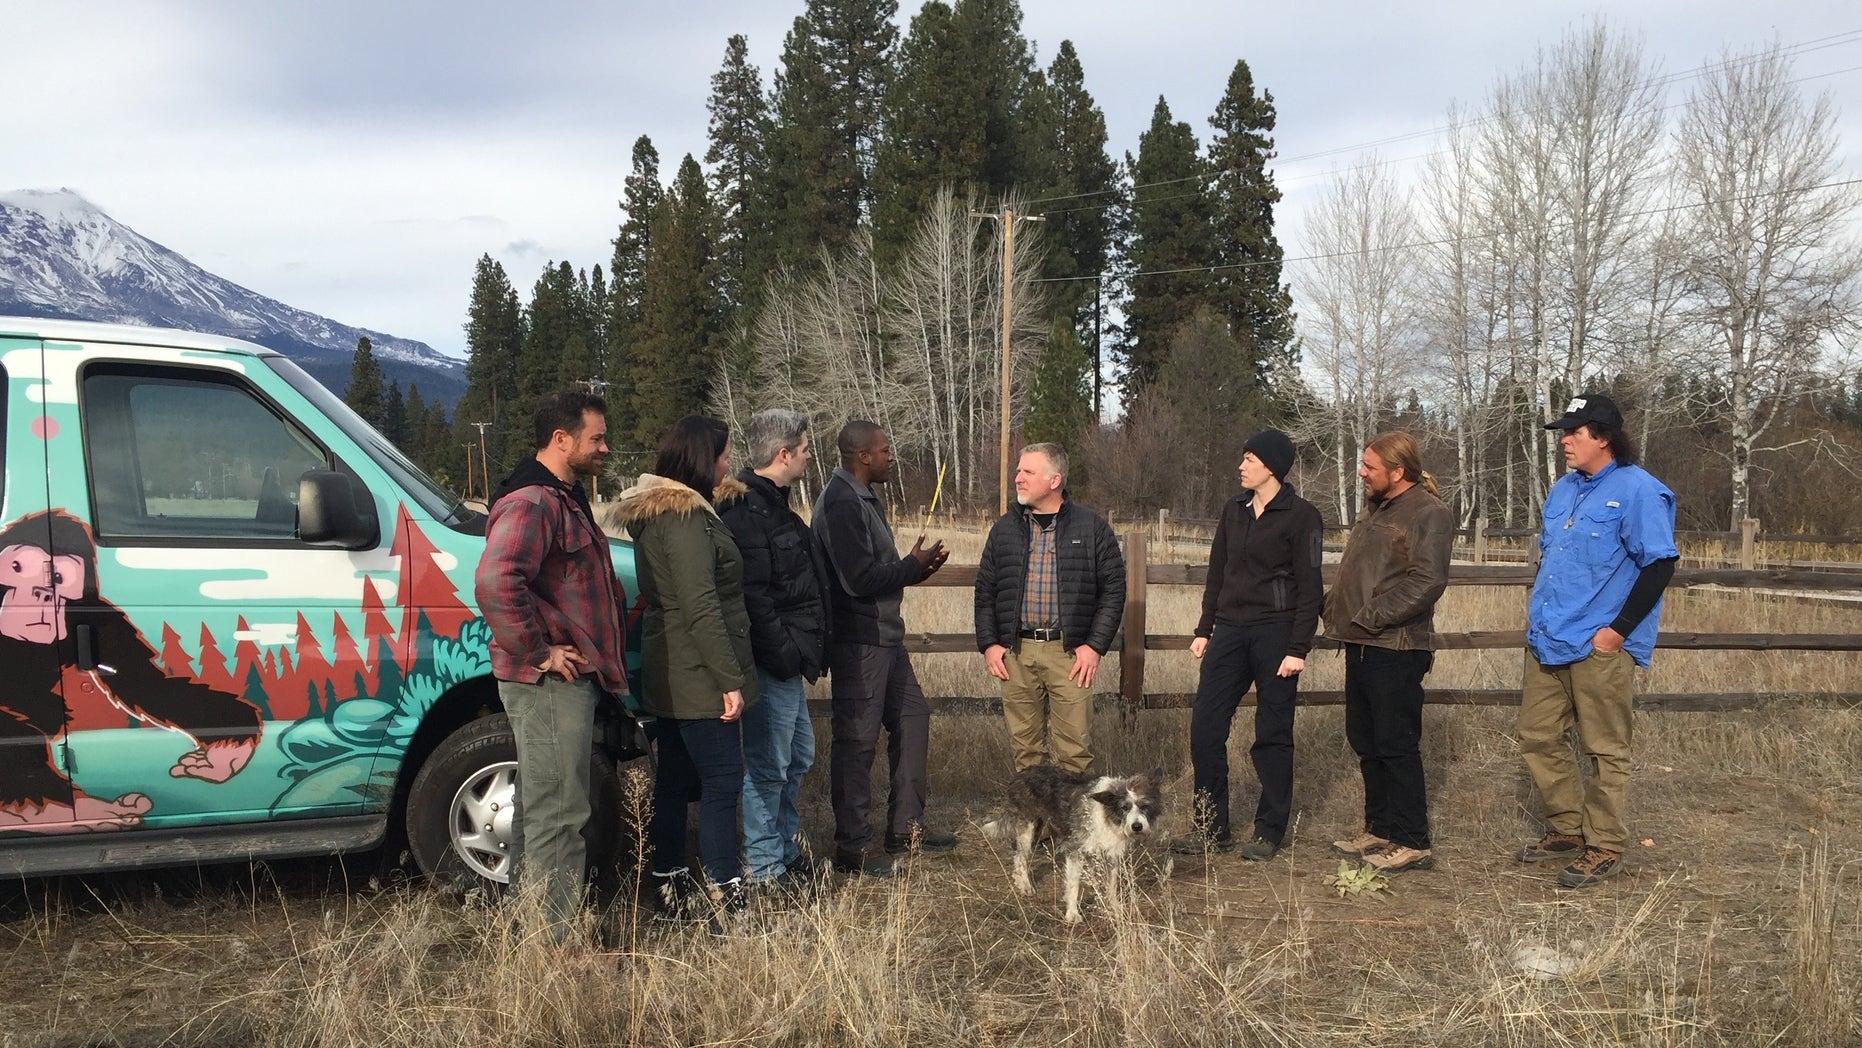 Cliff, Ranae, Matt, and Bobo team up with the Supernatural Bigfoot Crew to investigate strange sightings near Mt. Shasta.